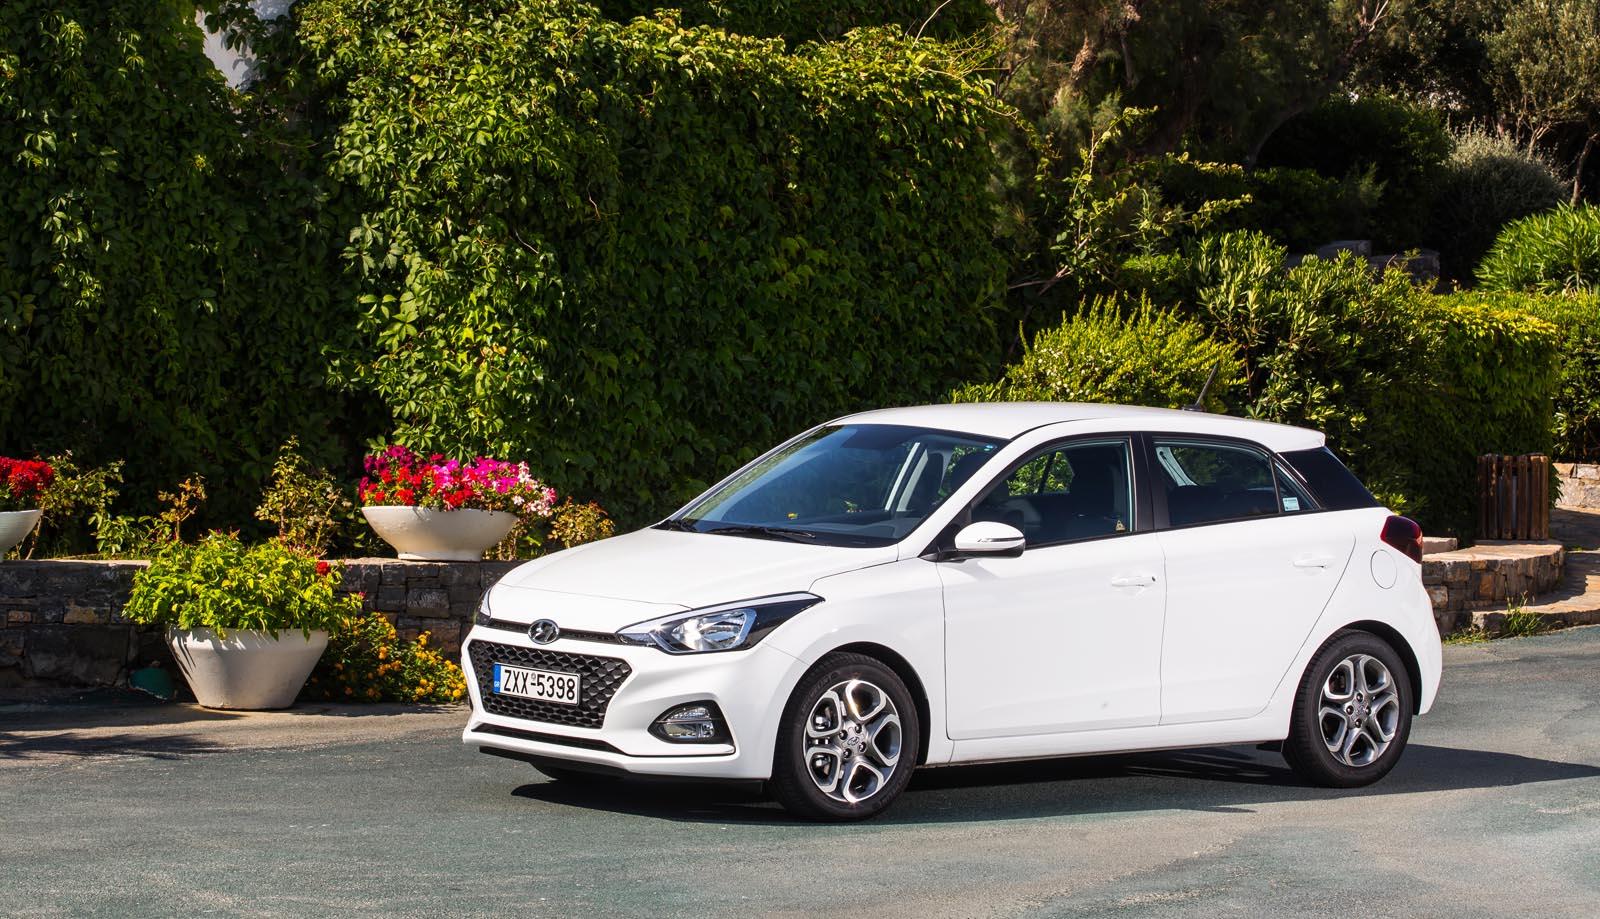 Photo of Έρχεται το ανανεωμένο Hyundai i20, από 11.190 ευρώ